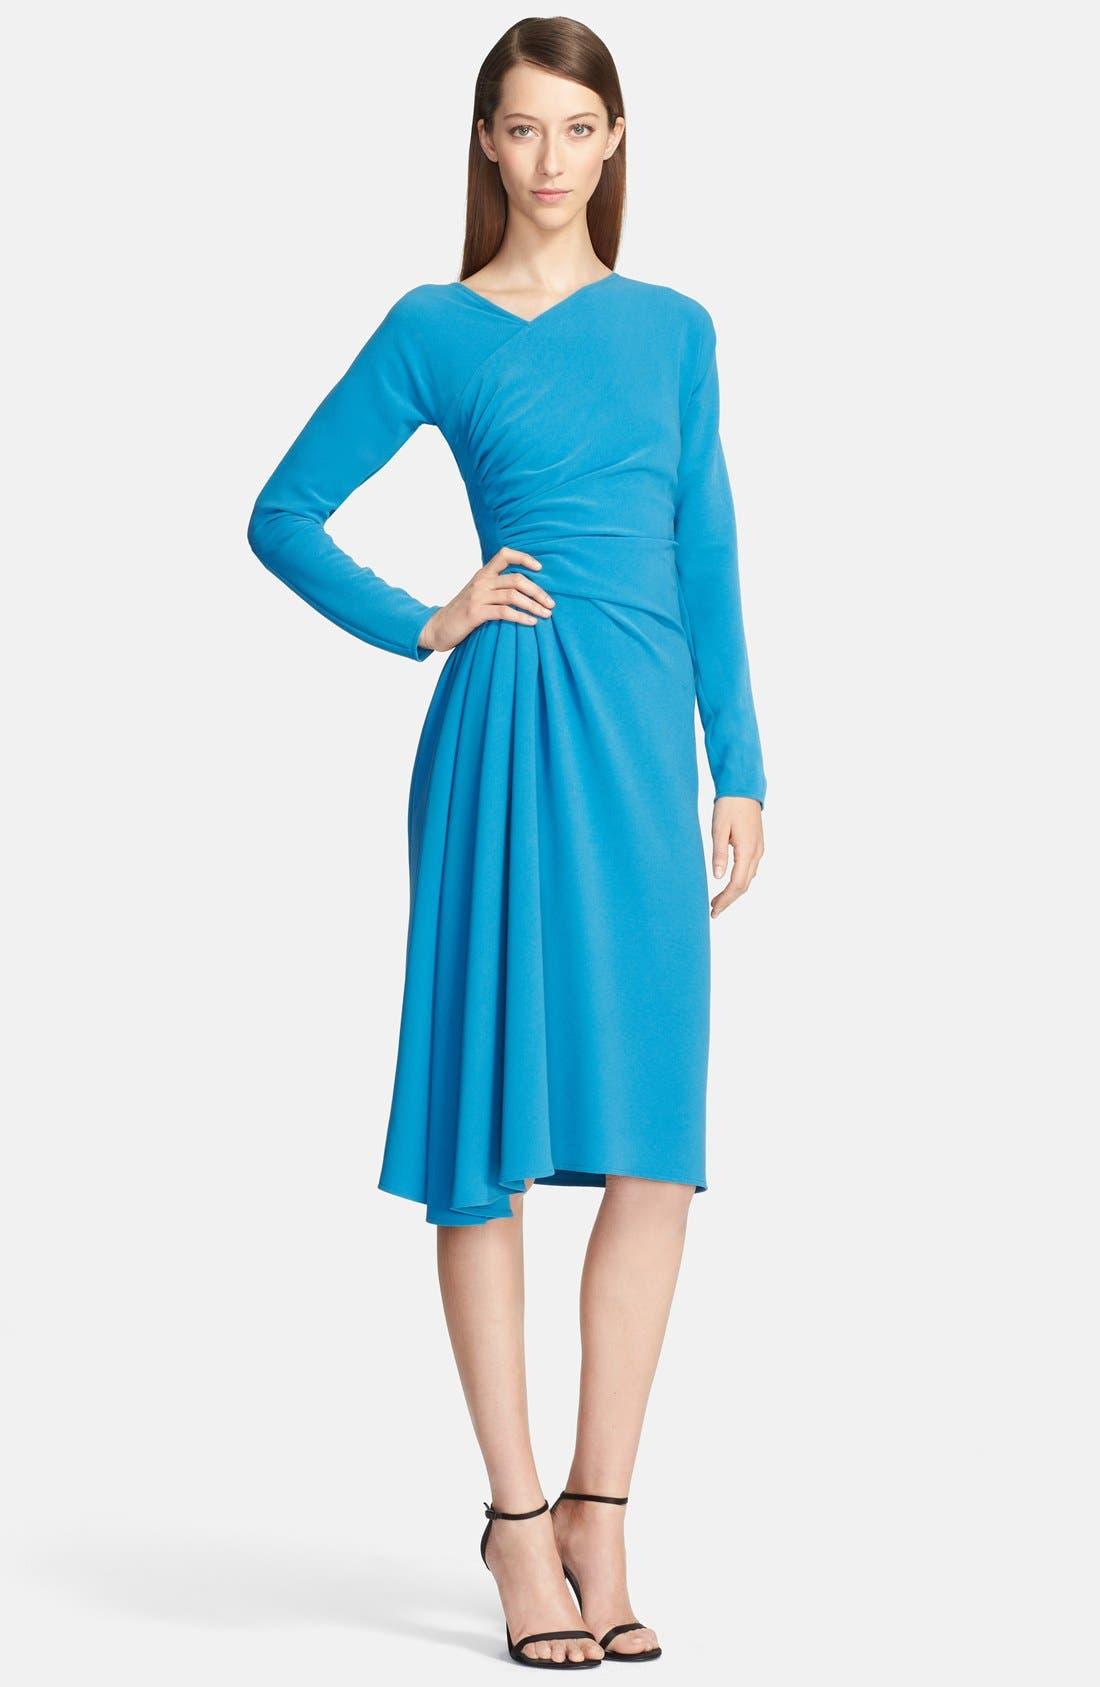 Alternate Image 1 Selected - St. John Collection Asymmetrical Drape Luxe Crepe Dress